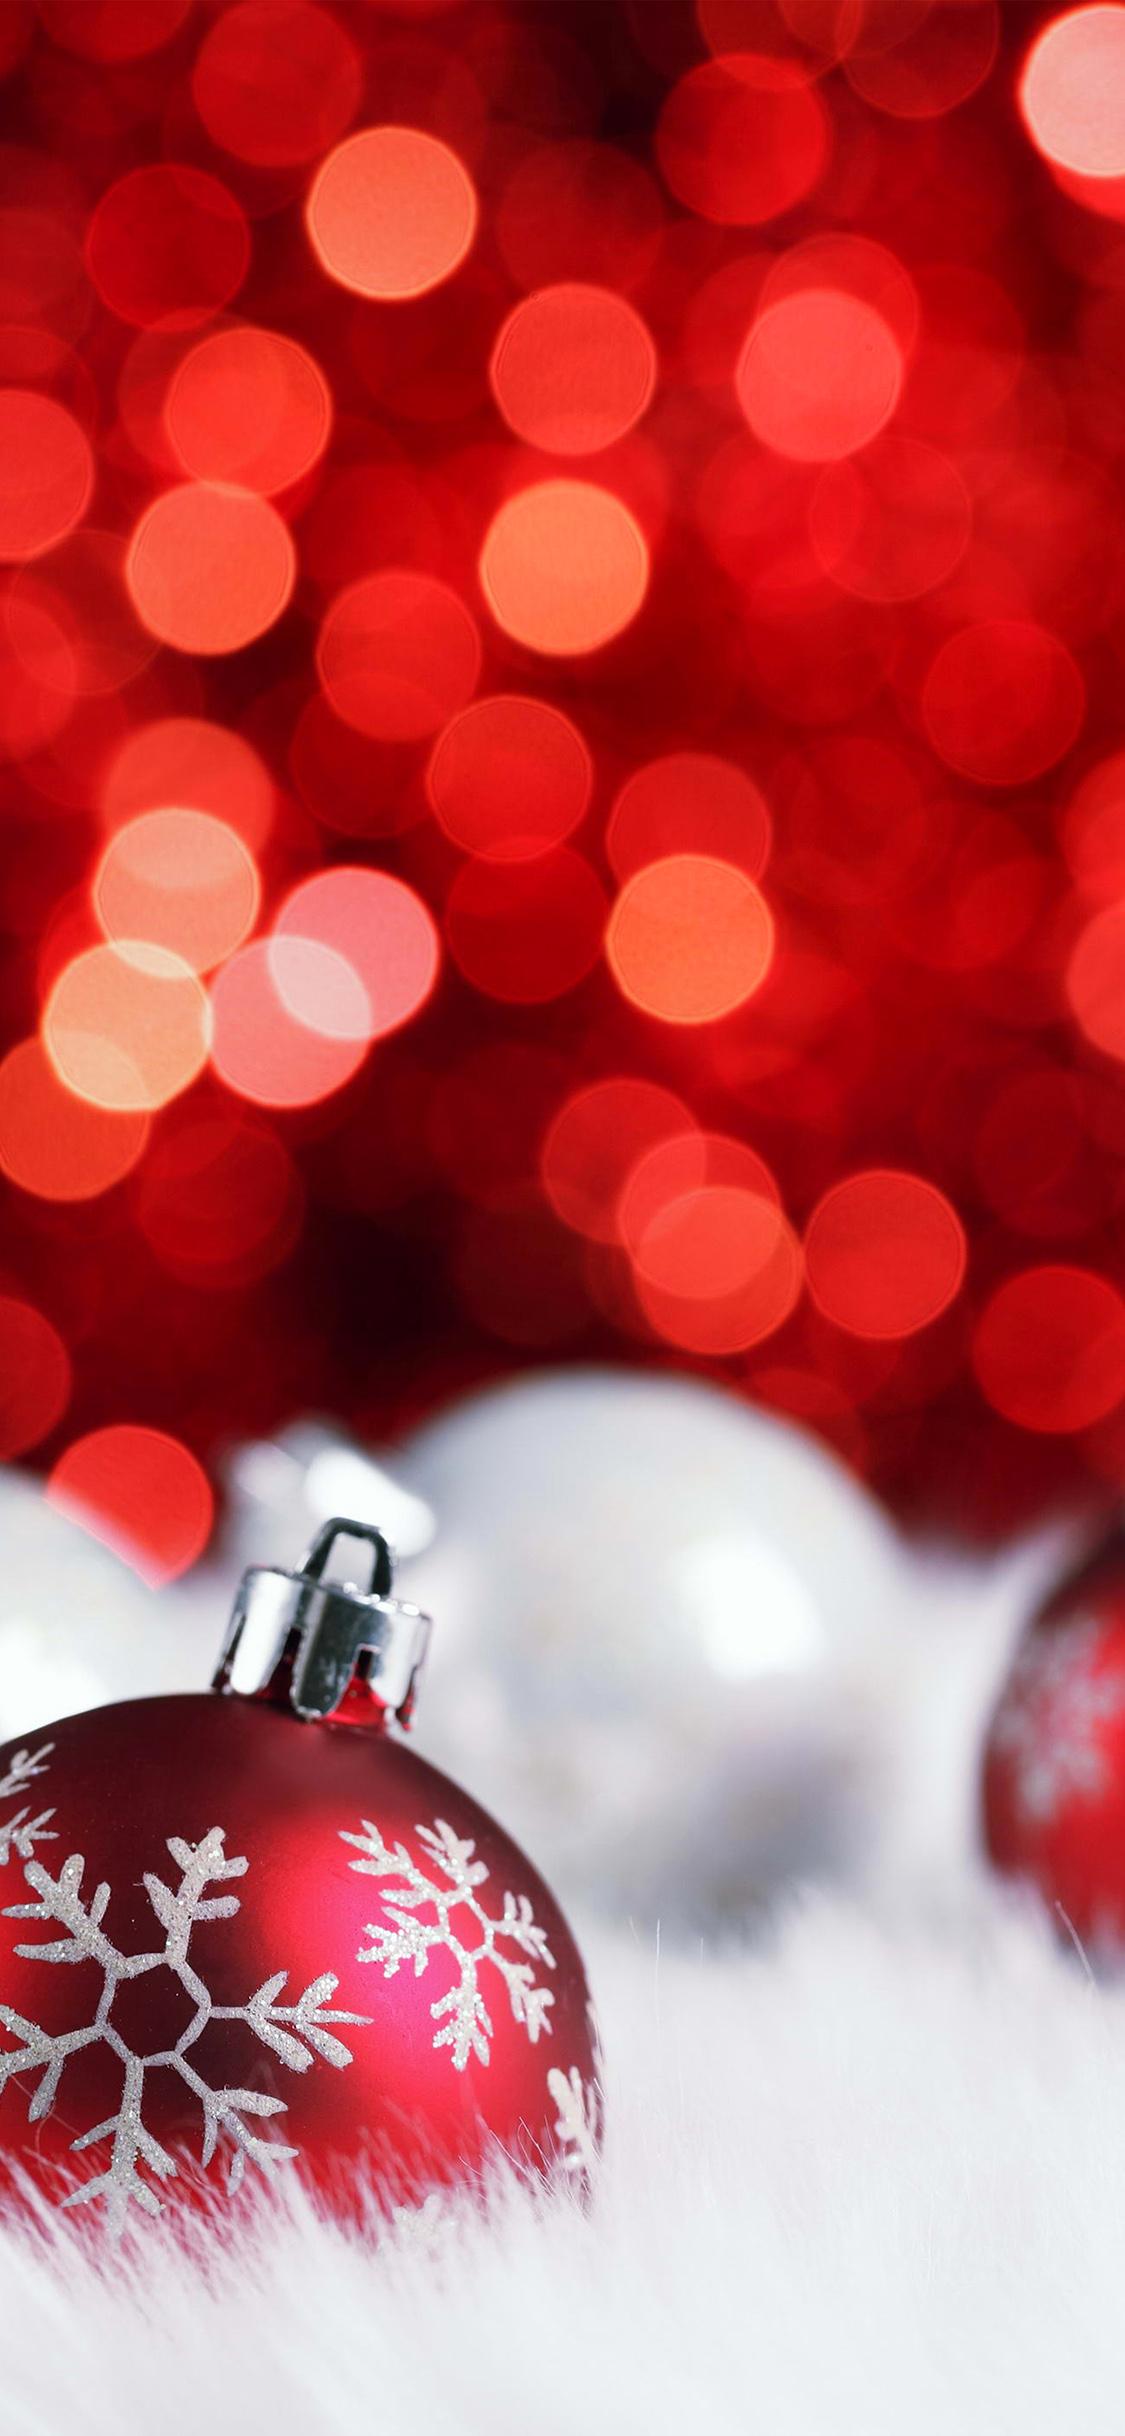 Christmas Bokeh Iphone X Wallpapers Free Download